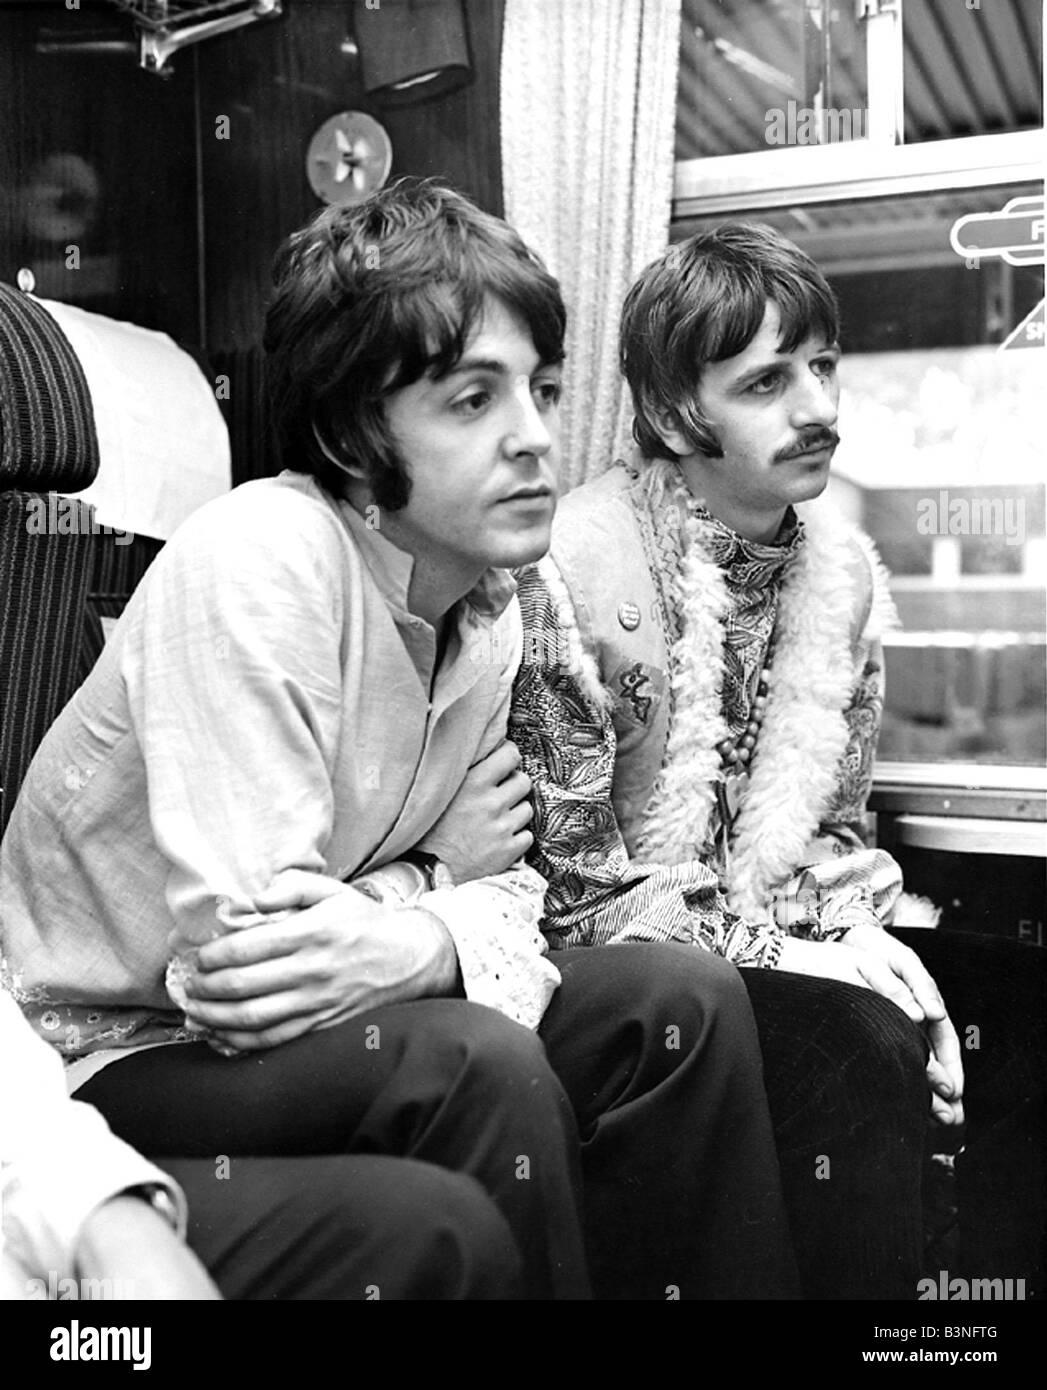 Paul McCartney Ringo Starr During Train Journey With Maharishi Mahesh Yogi The Beatles Inside Carriage August 1967 1960s